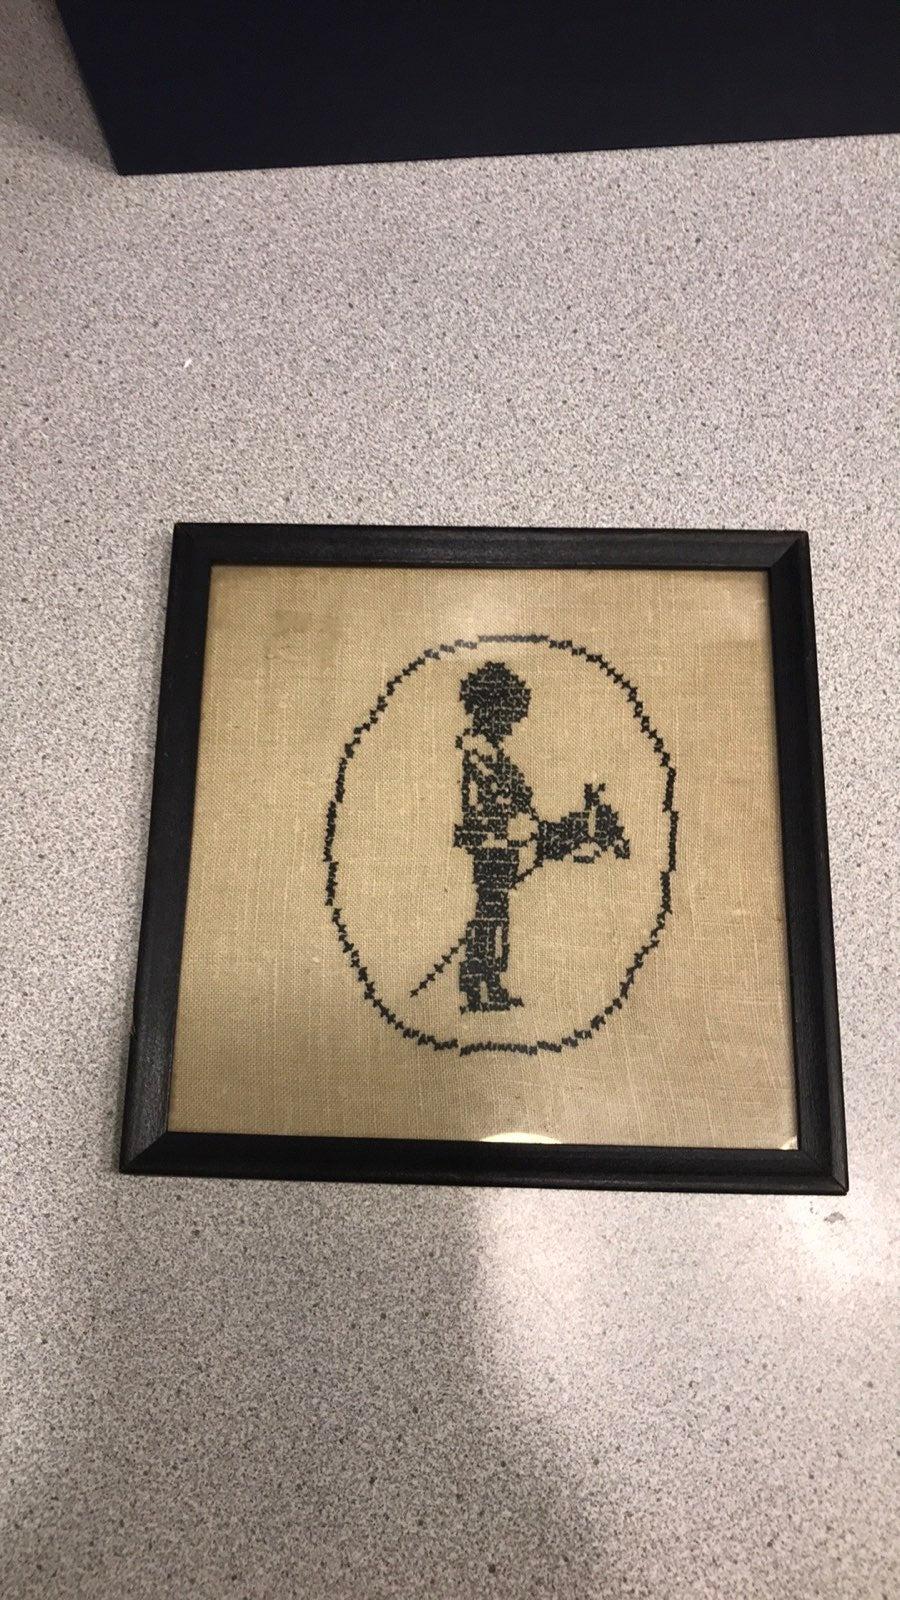 Vintage Cross-stitch Framed boy and hors